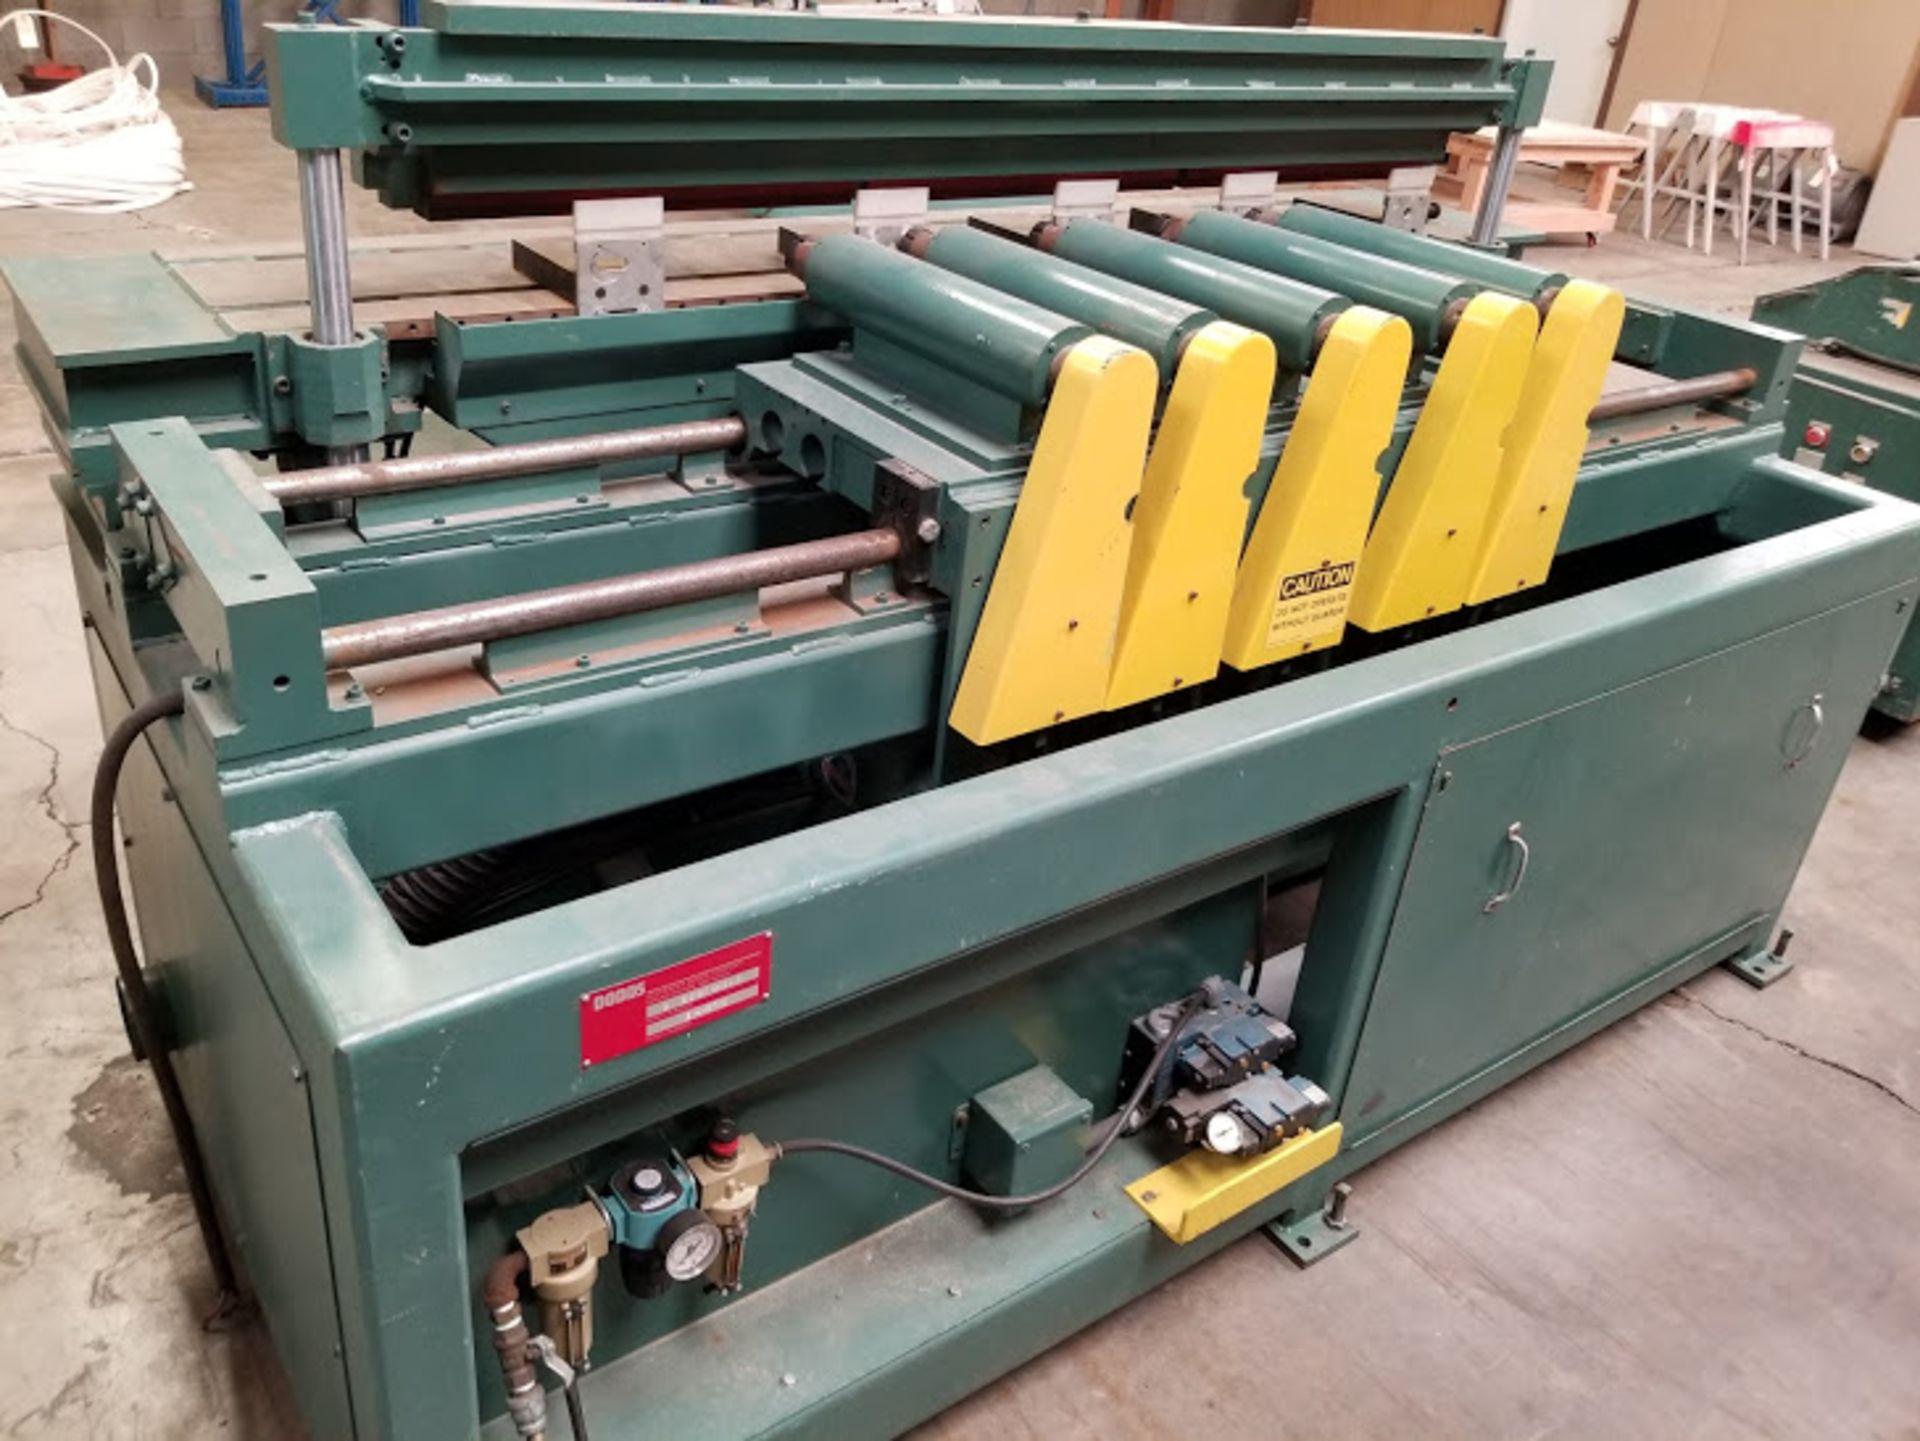 Lot 6 - Dodds 5 Spindle Boring Machine, Model #B-802, 5 - Baldor 1.5 HP 208-230/460 Volts 3 phase Motors,